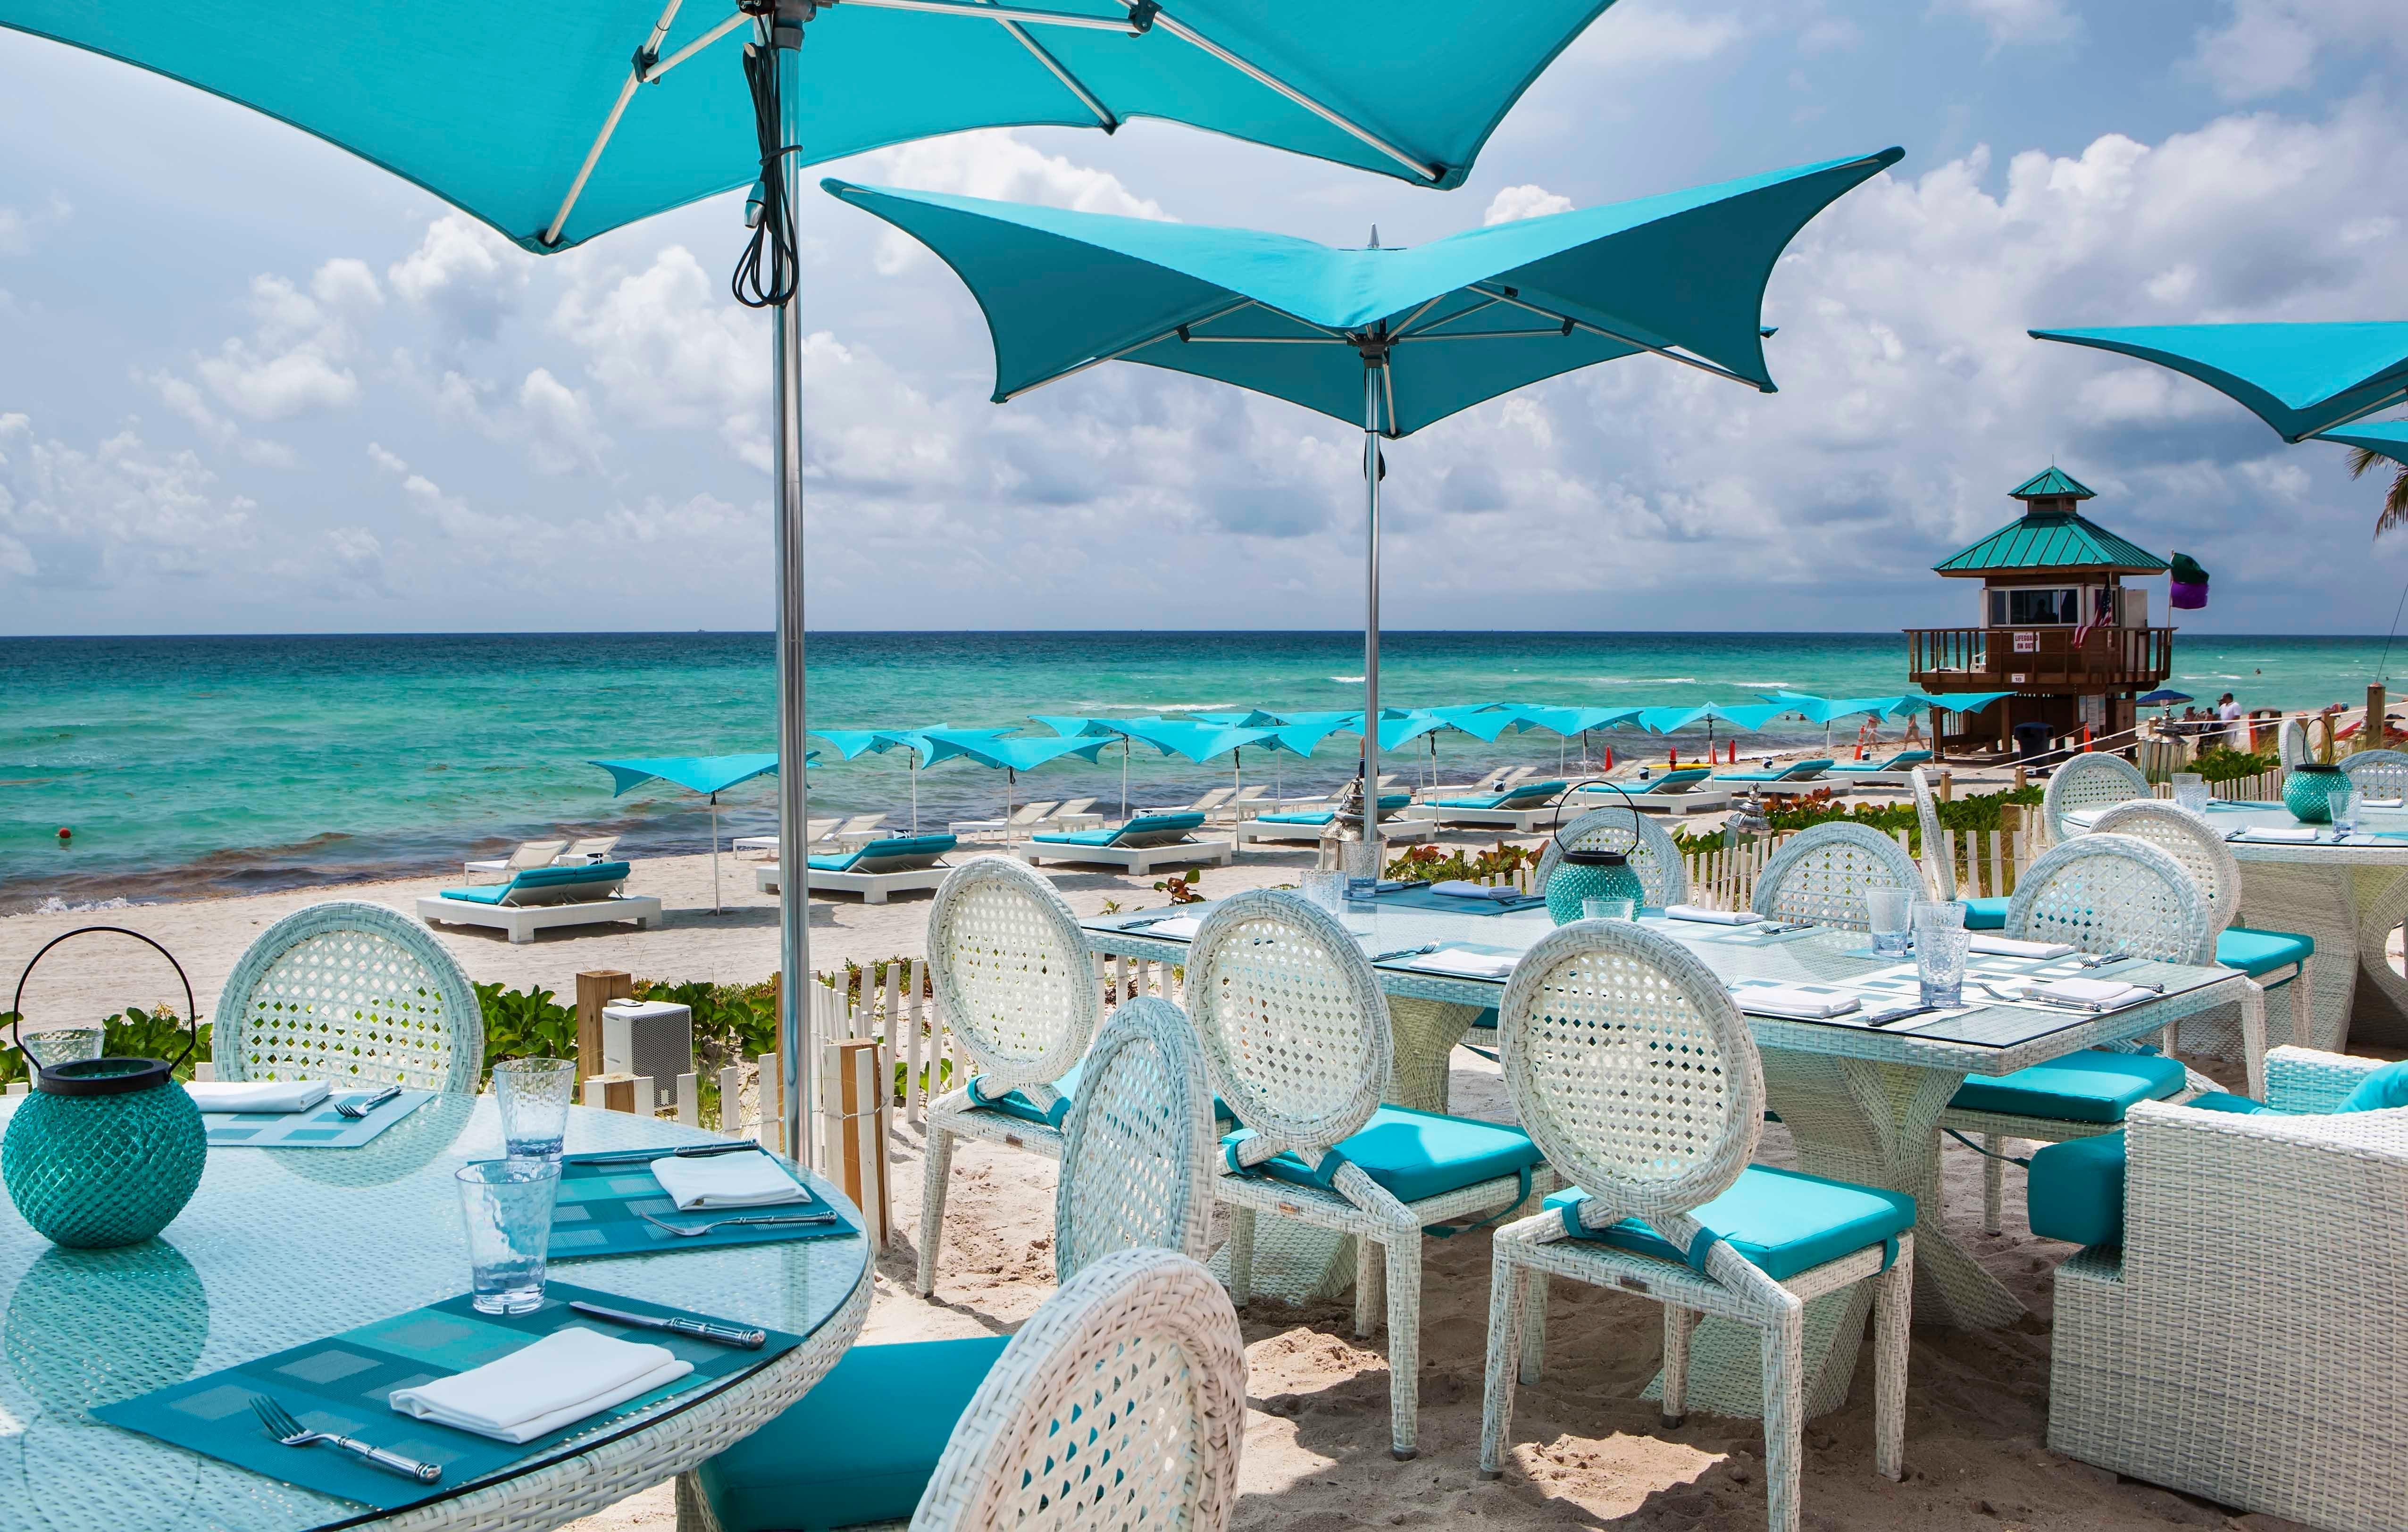 Trump International Beach Resort in Sunny Isles Beach, FL | Whitepages